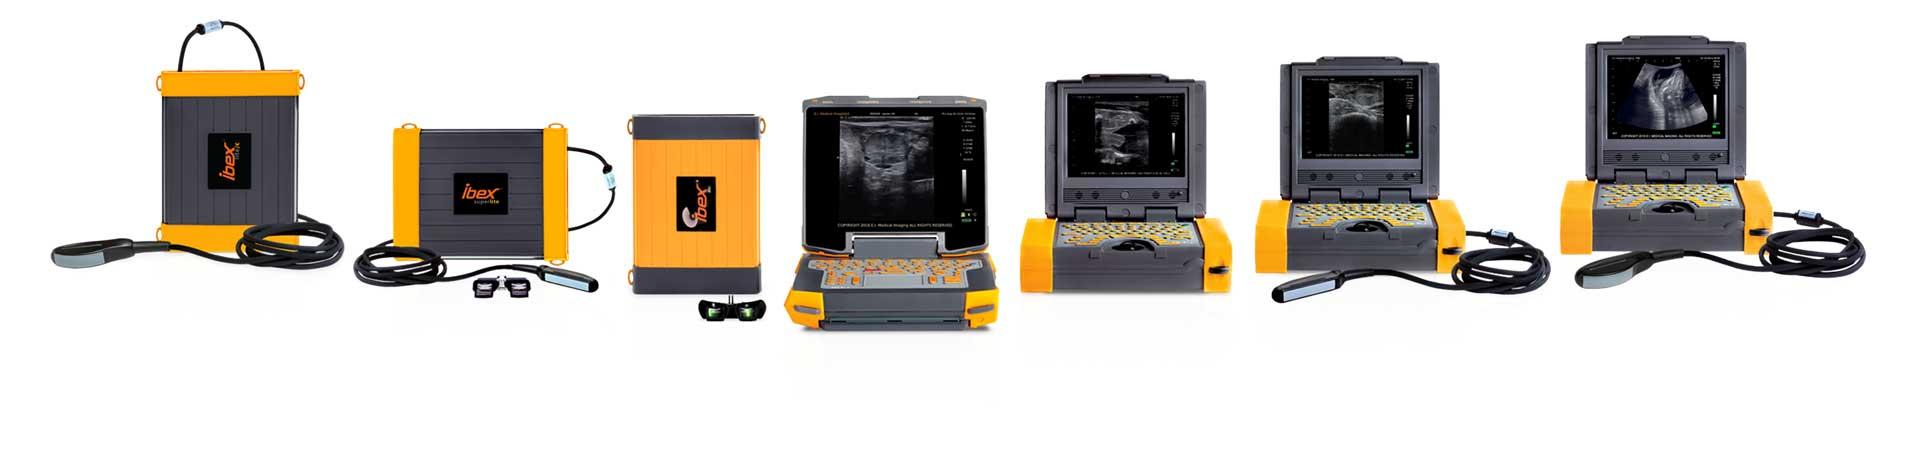 EIMI's ultrasound lineup